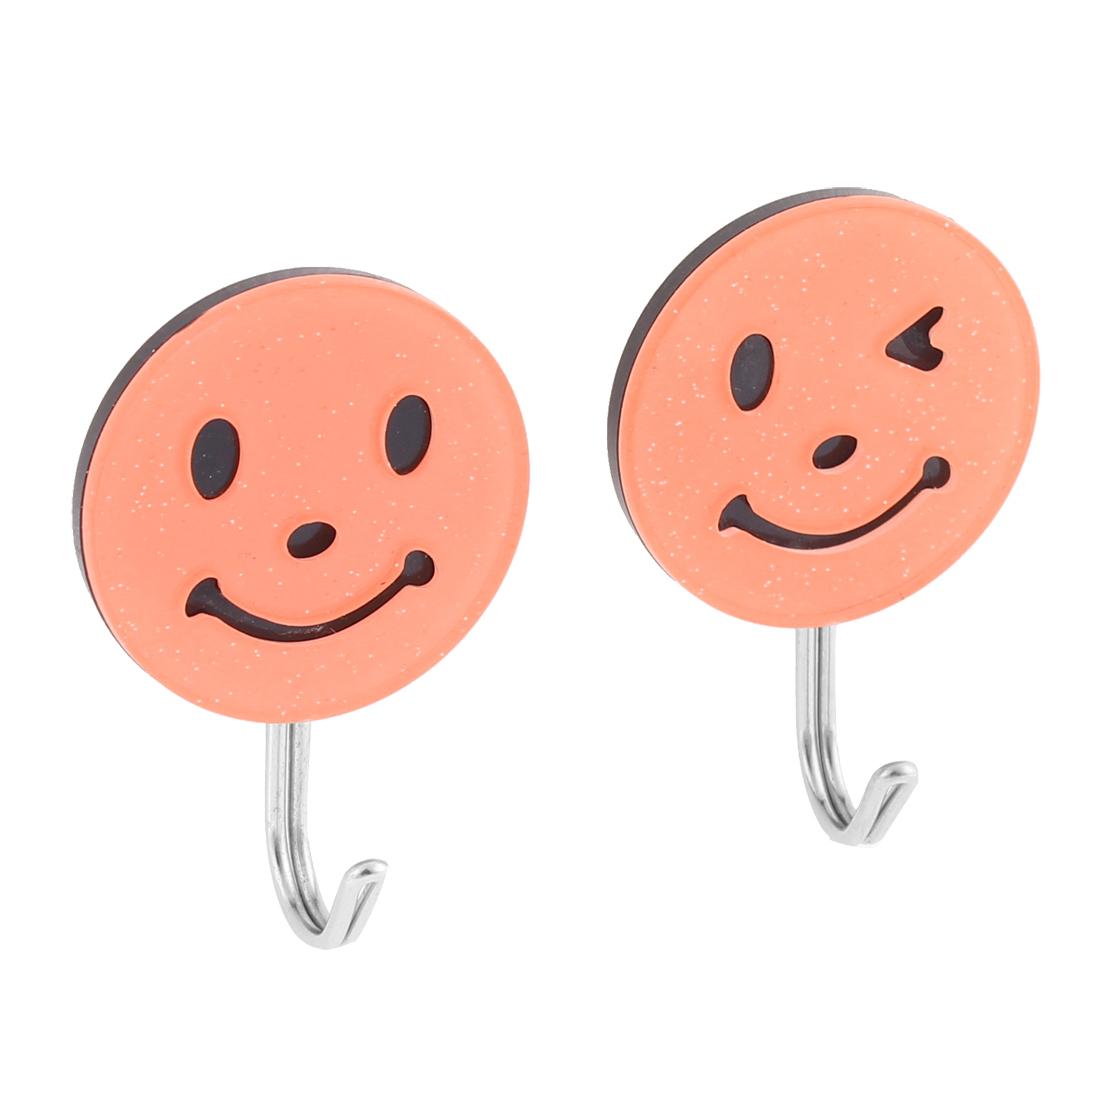 Household Self Adhesive Smile Face Style Cap Bag Hanger Holder Hook 2 Pcs